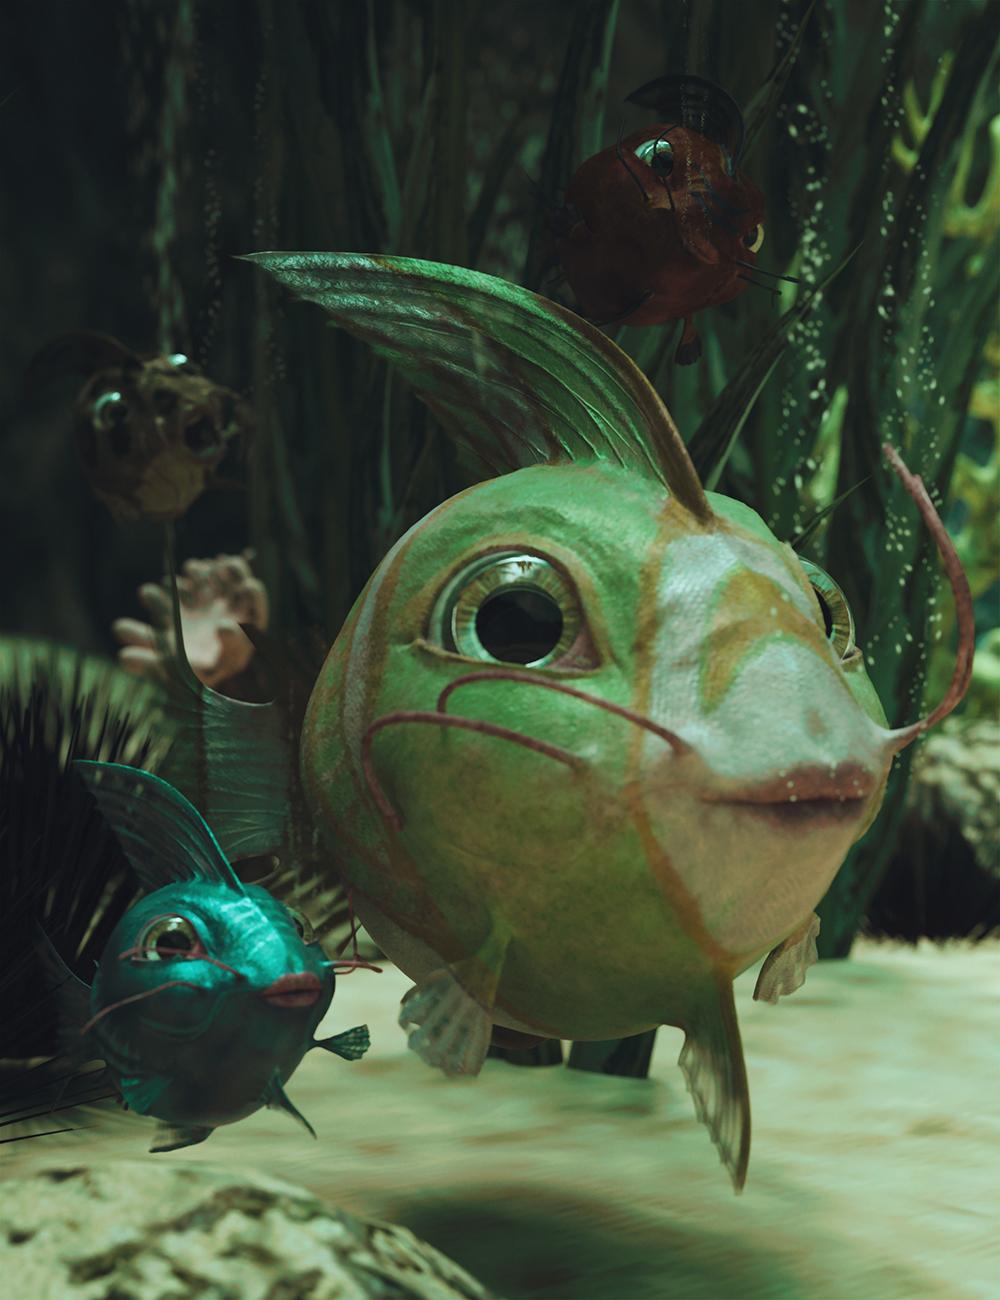 Amipiscus Friendly Fish Original Figure by: Sixus1 MediaSubSpeciesCreations, 3D Models by Daz 3D